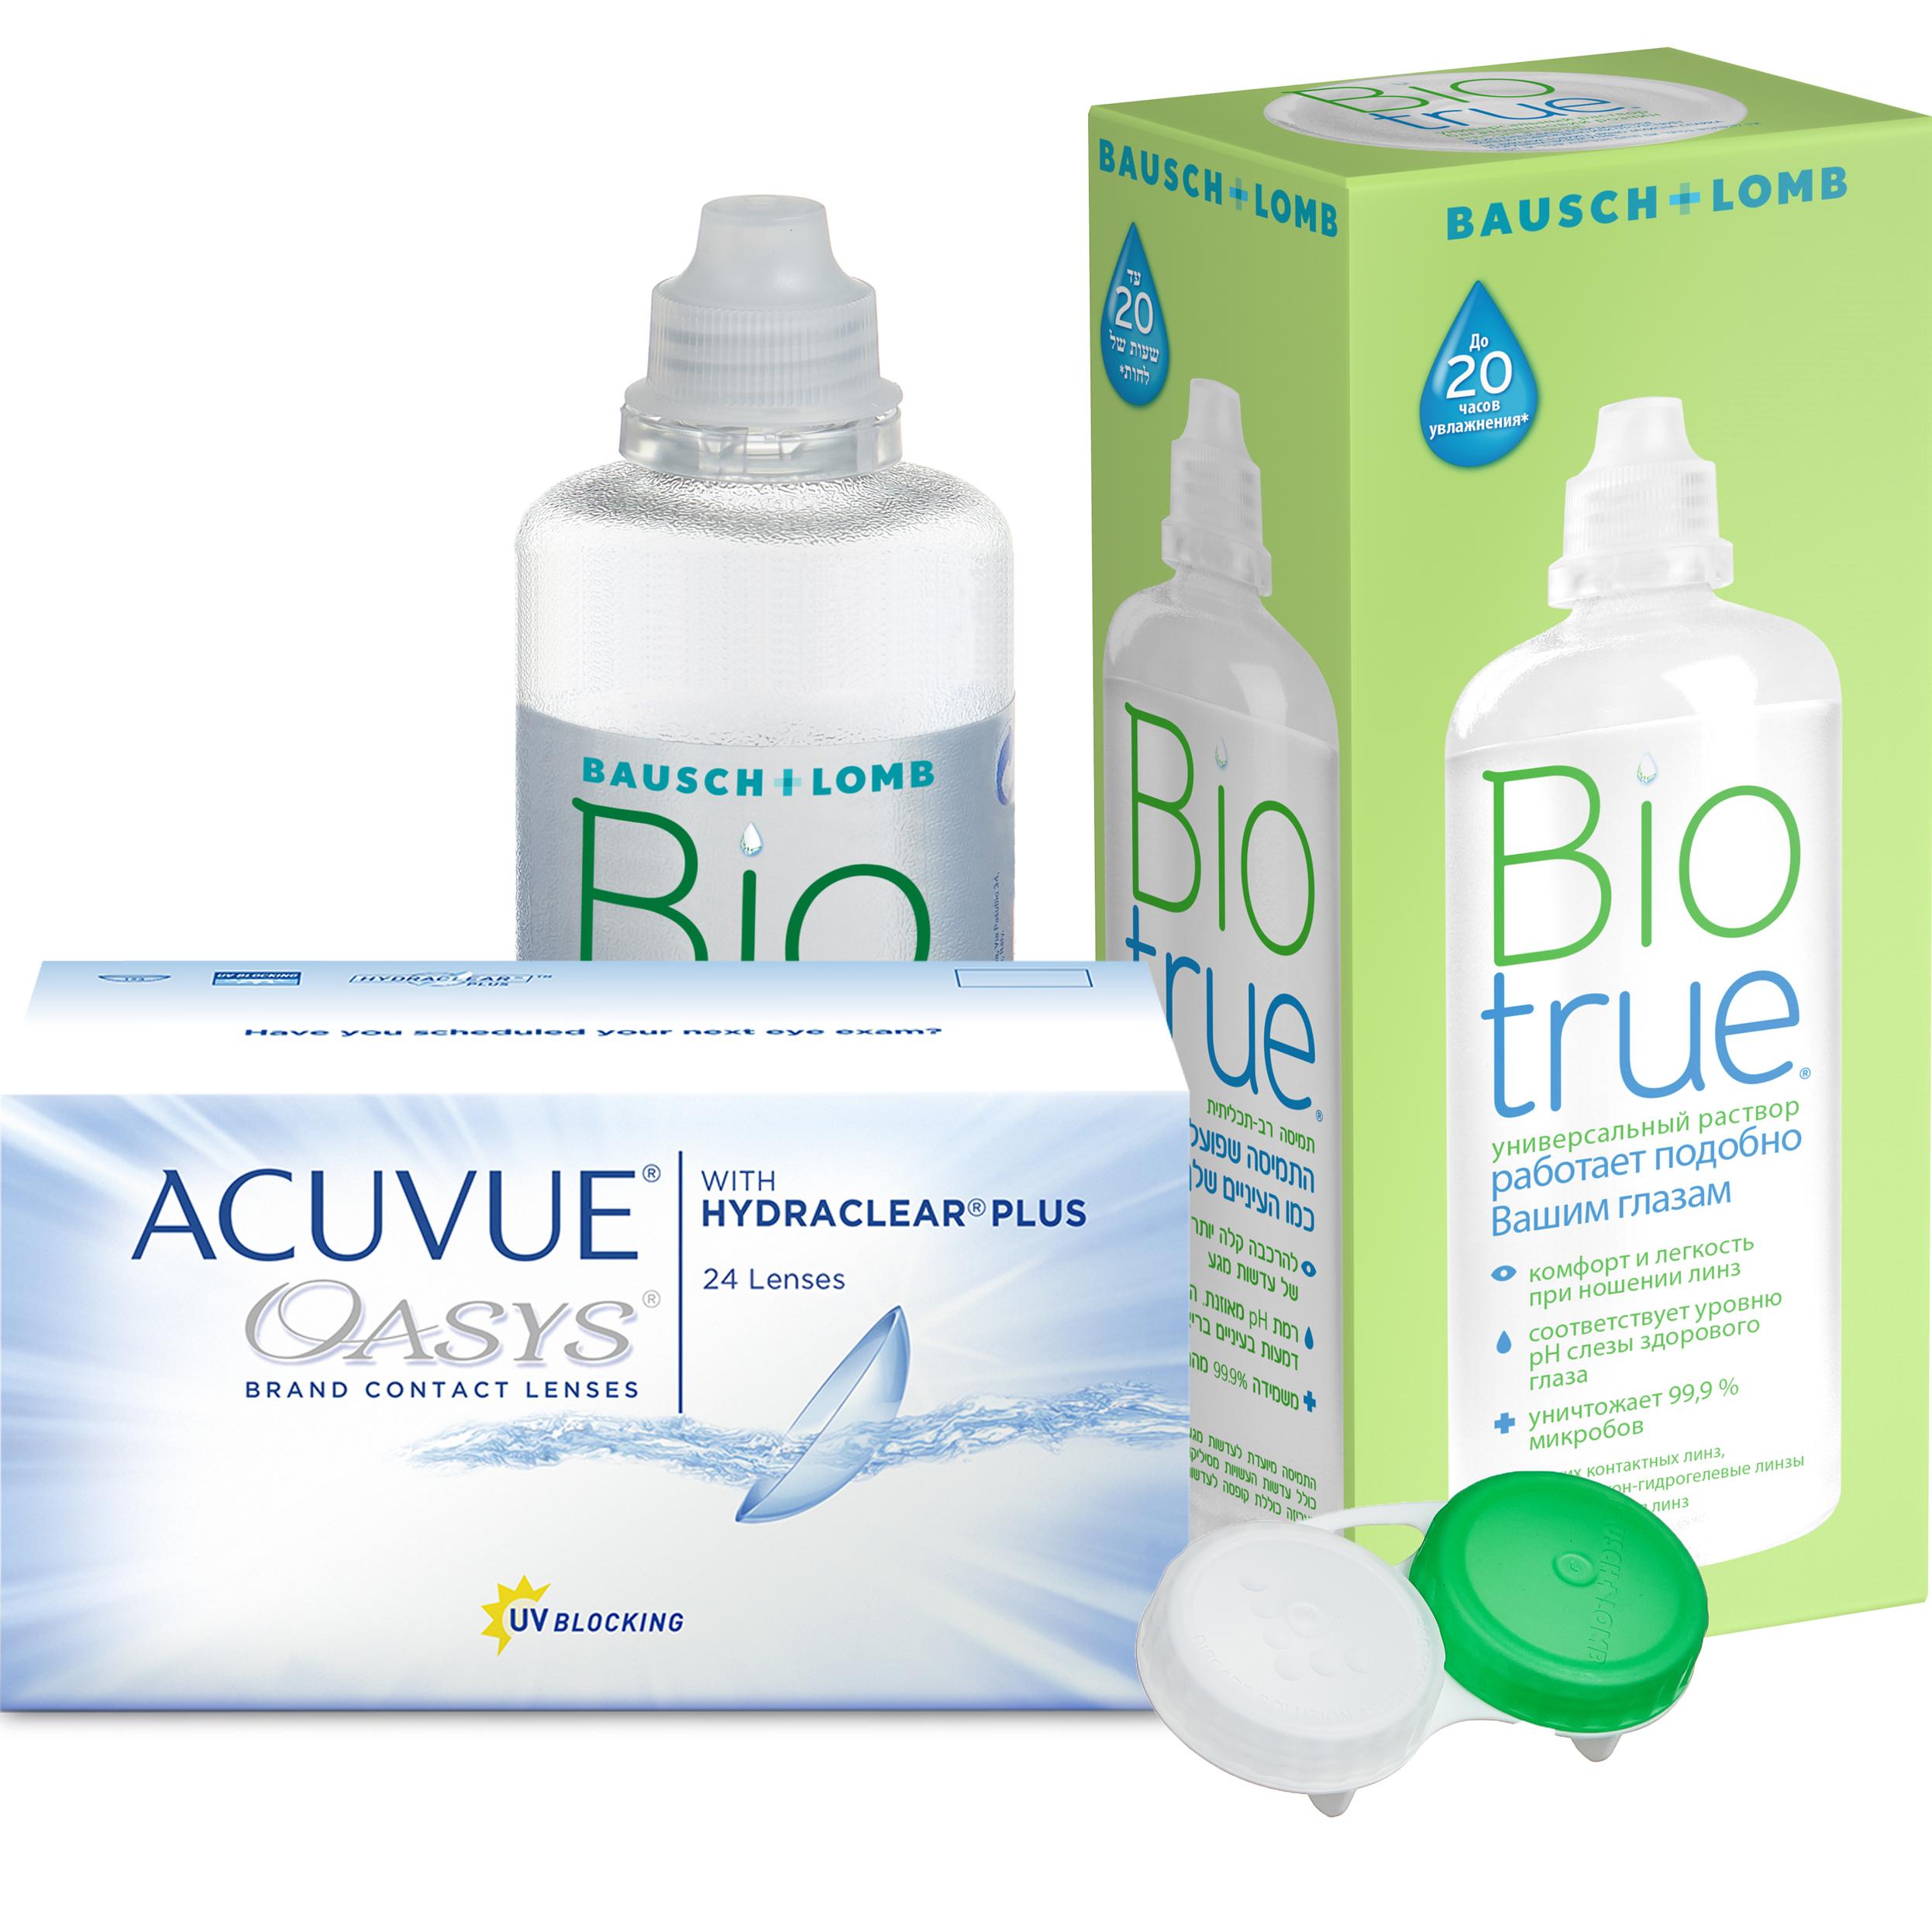 Купить Oasys with Hydraclear Plus 24 линзы + Biotrue, Контактные линзы Acuvue Oasys with Hydraclear Plus 24 линзы R 8.4 -4, 50 + Biotrue 300 мл